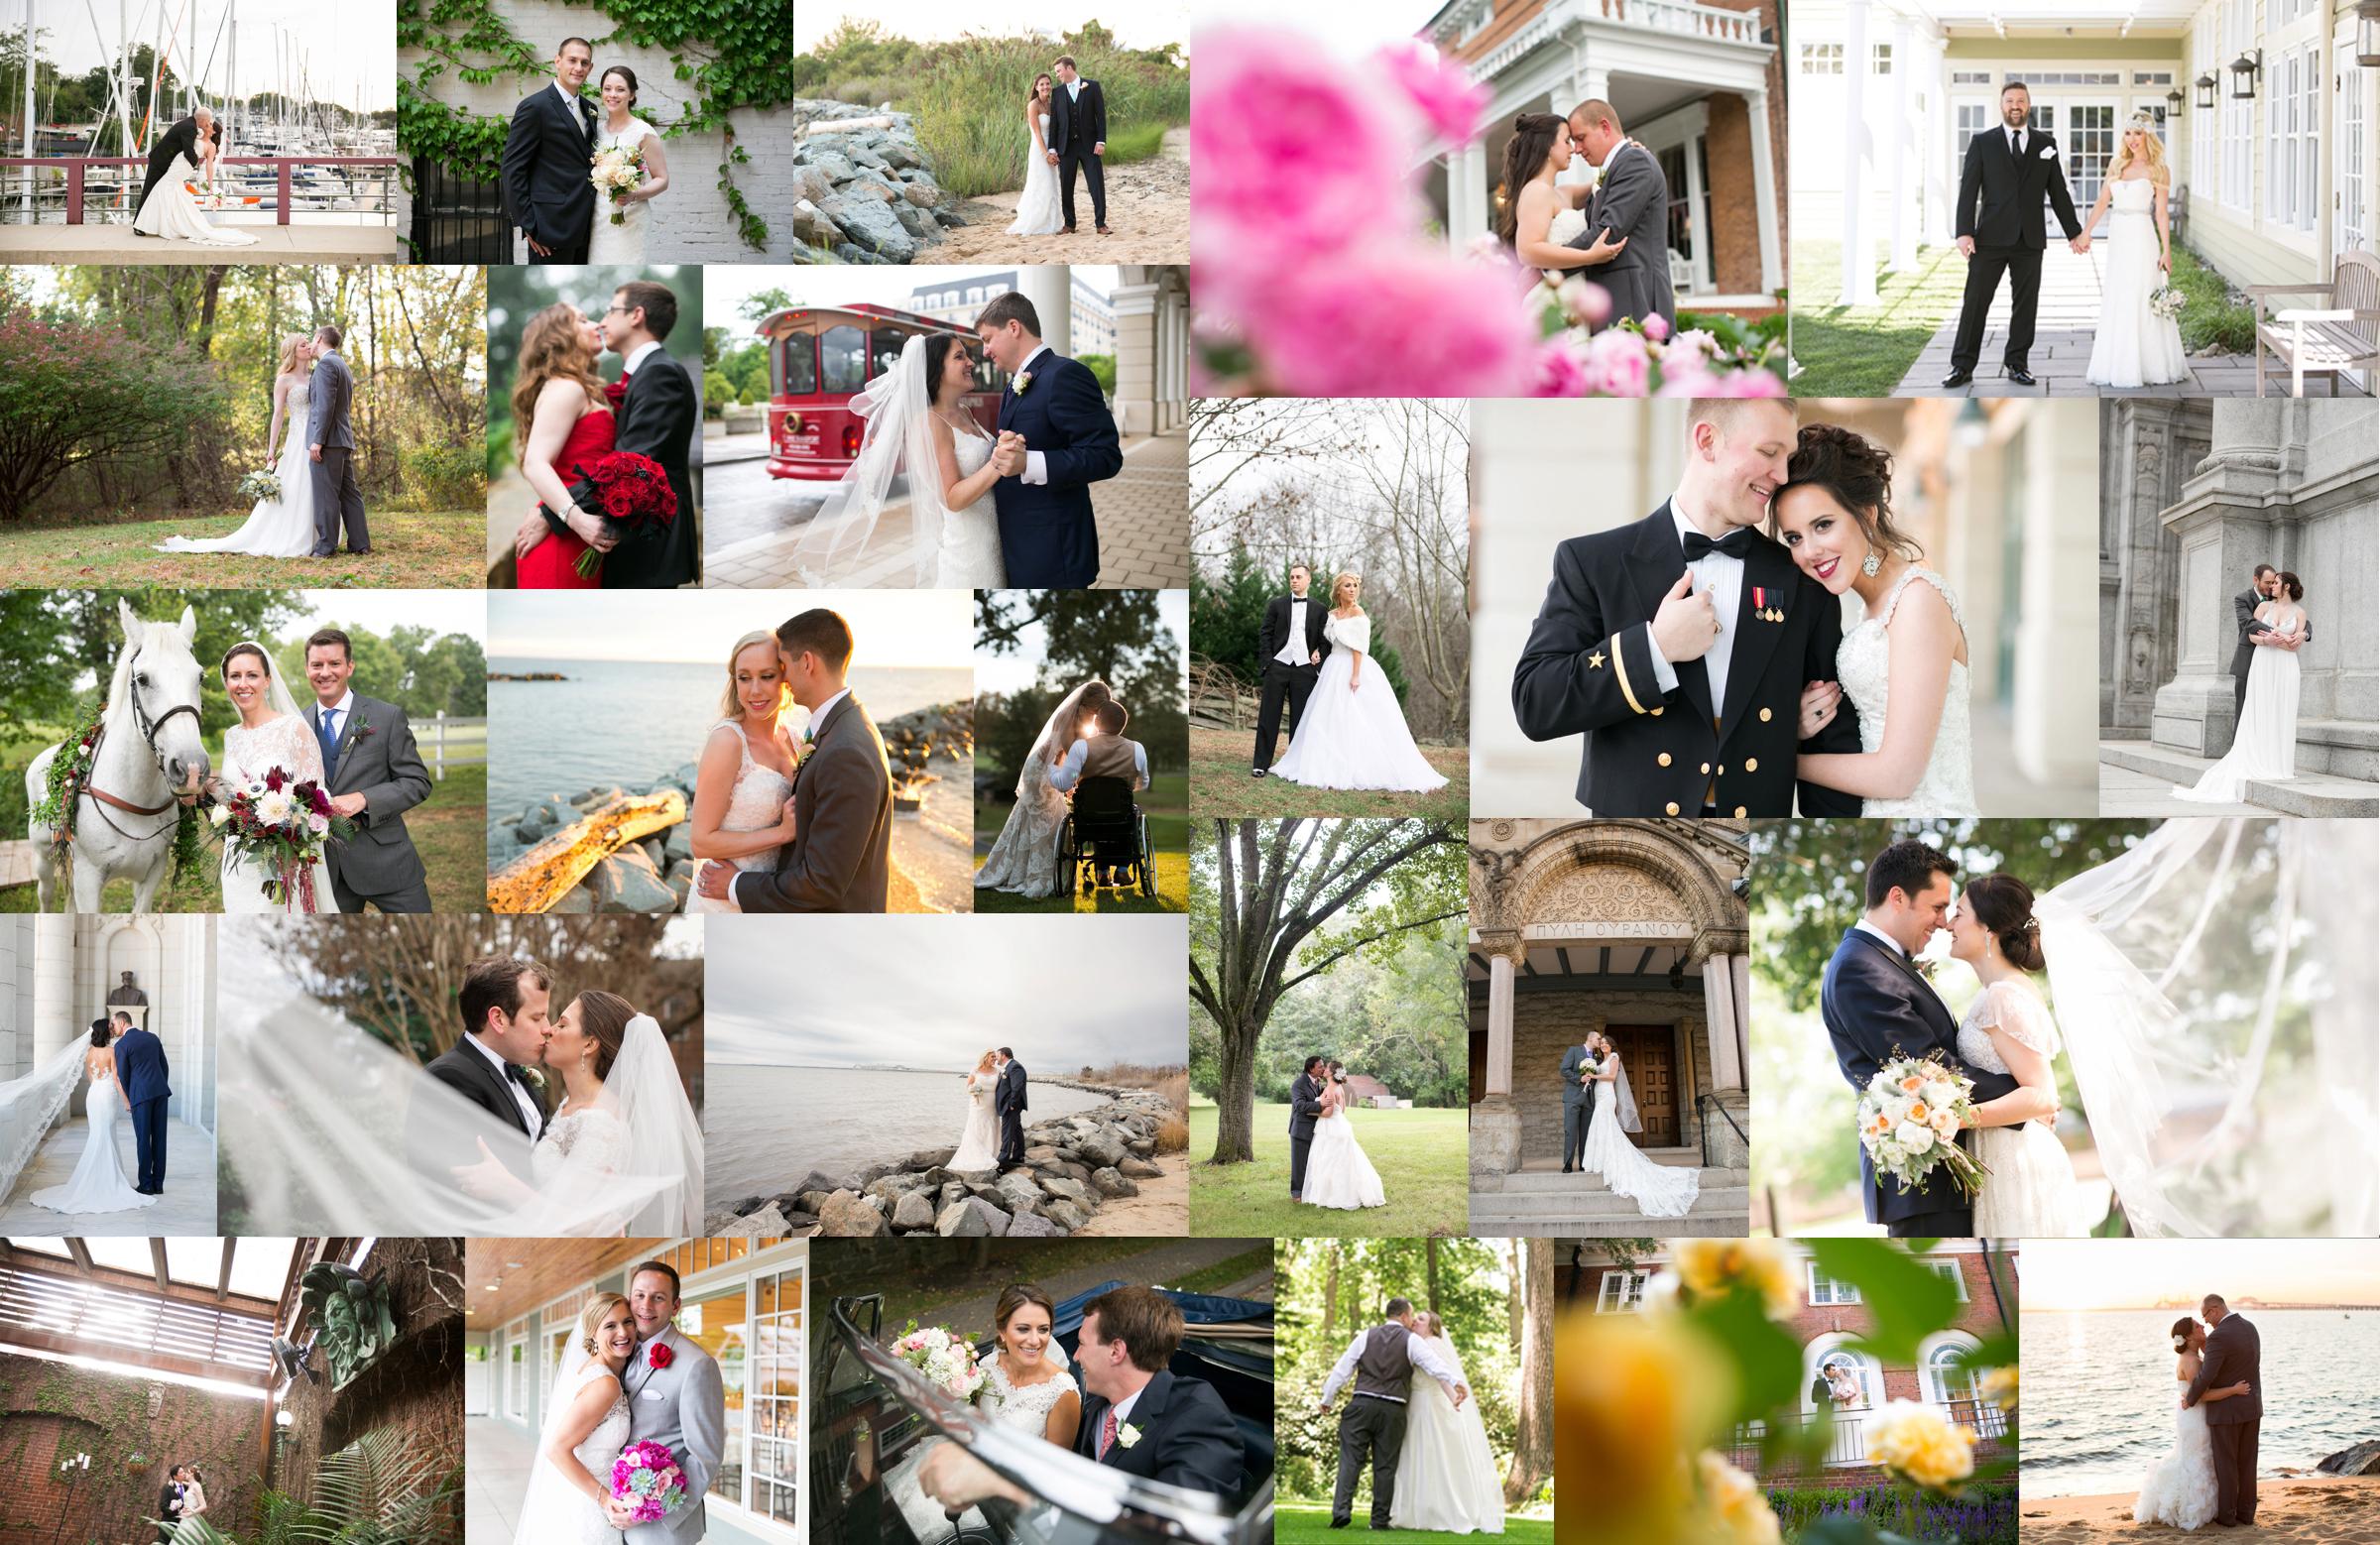 Best Philadelphia Wedding Photographer - 2016 Wedding Recap